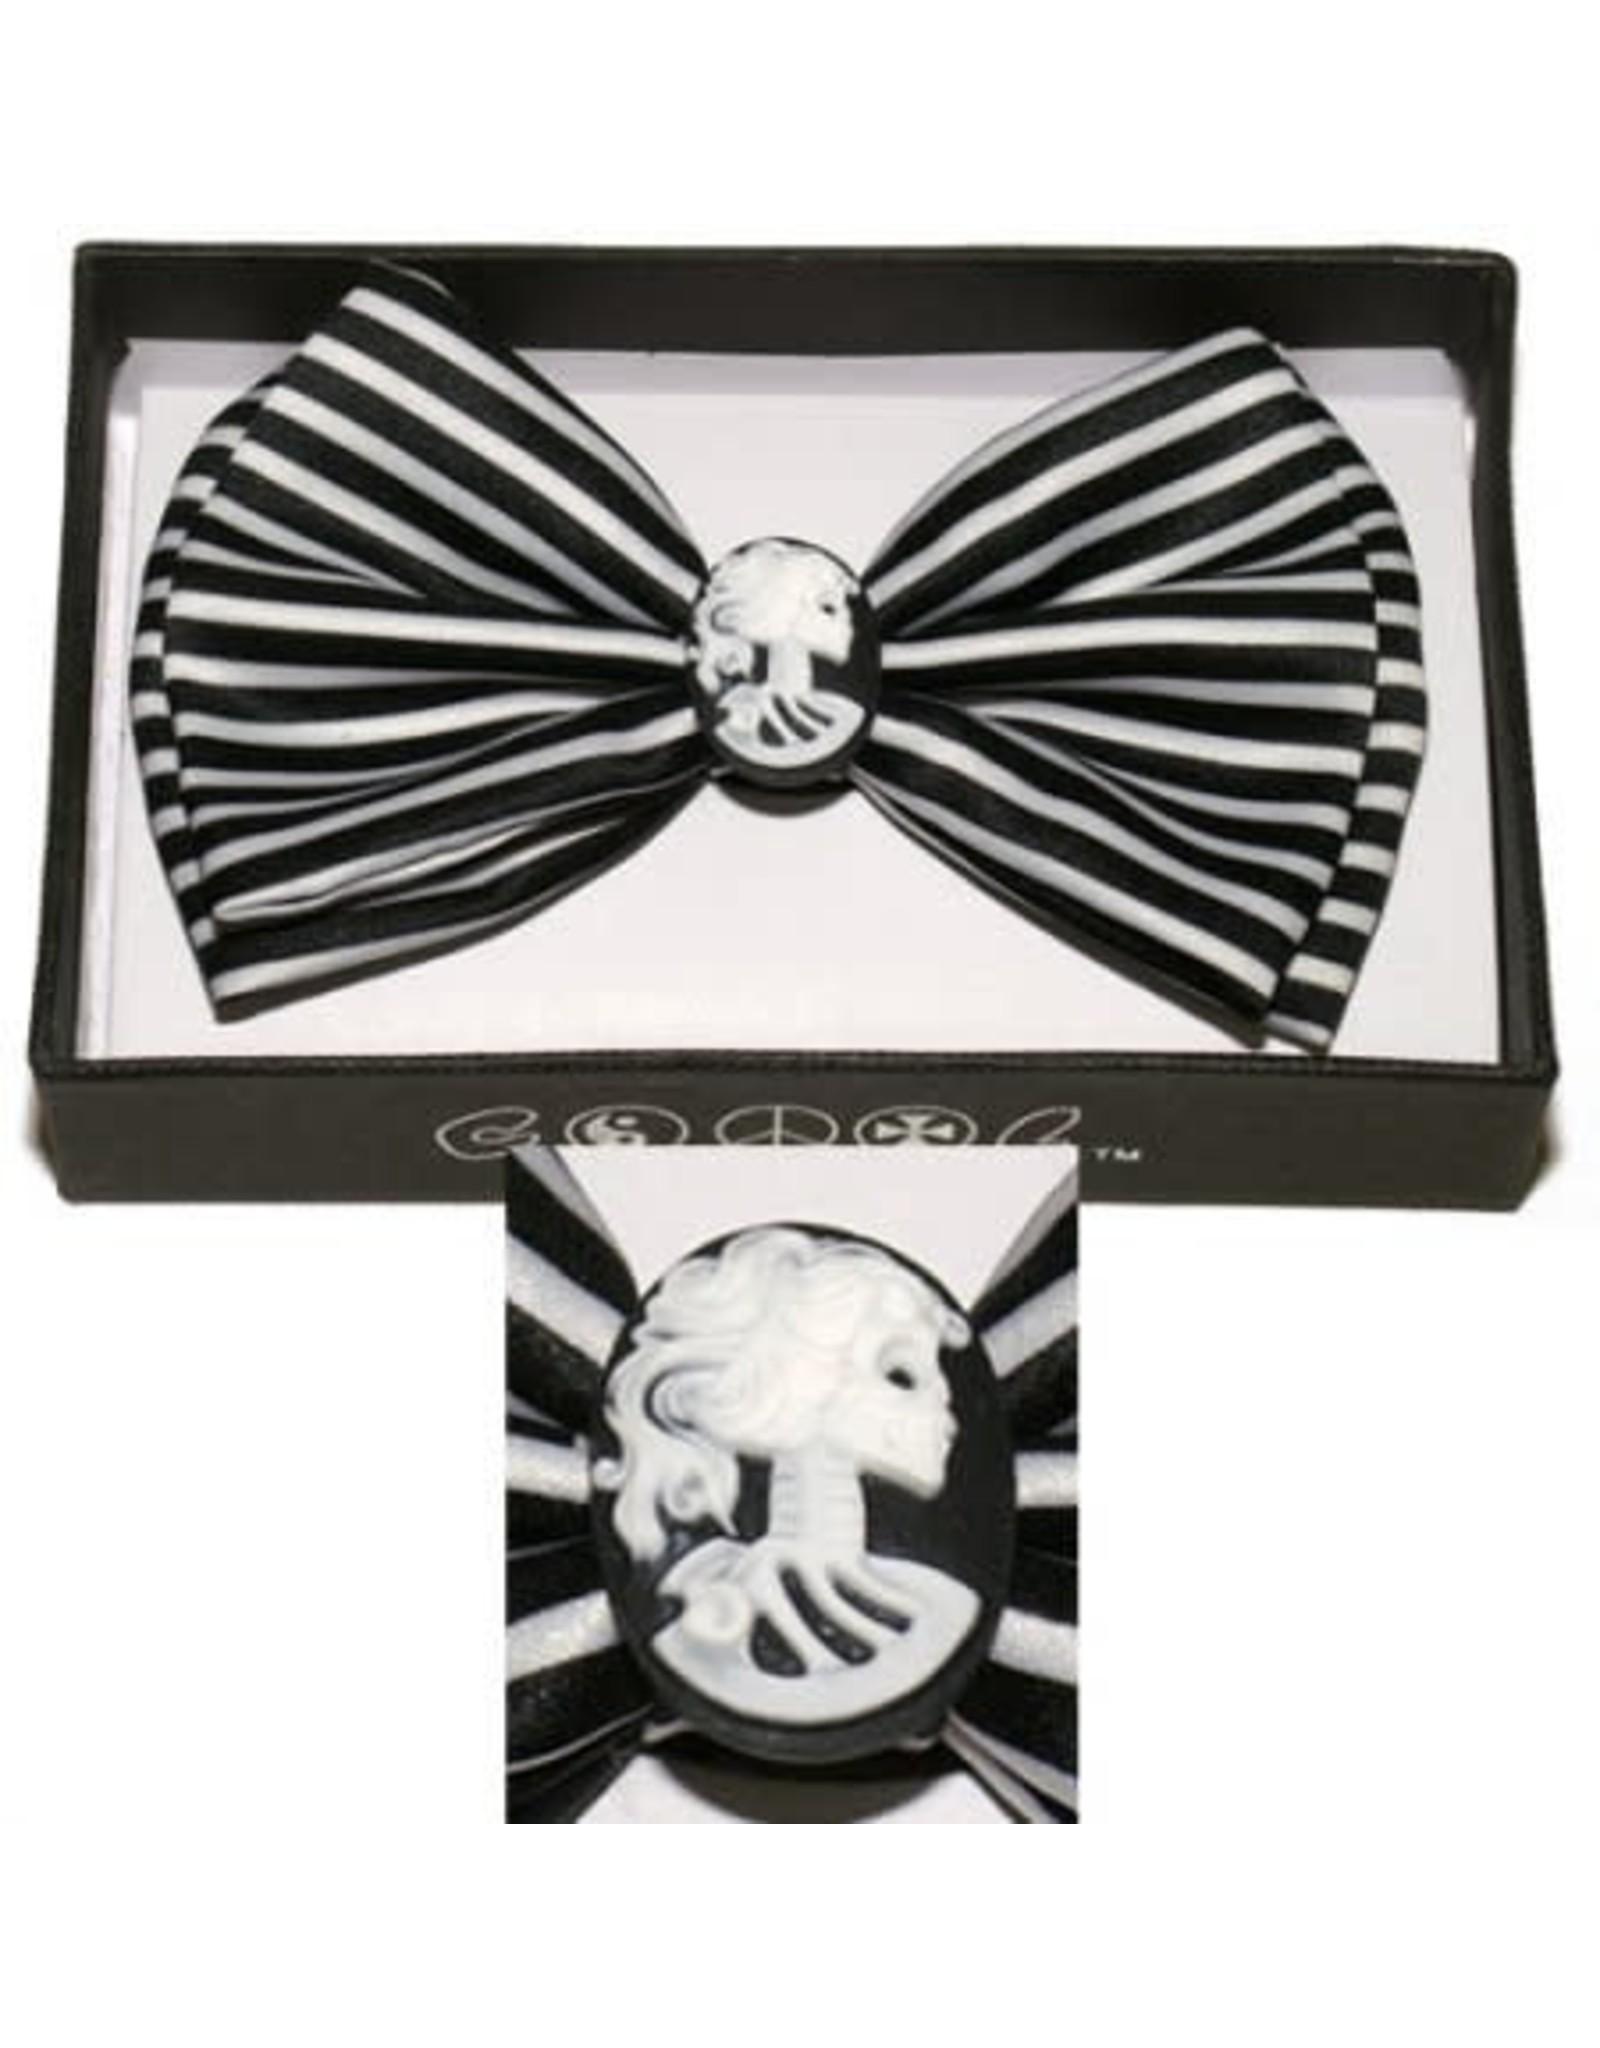 Leema Bow Tie Cameo Stripe